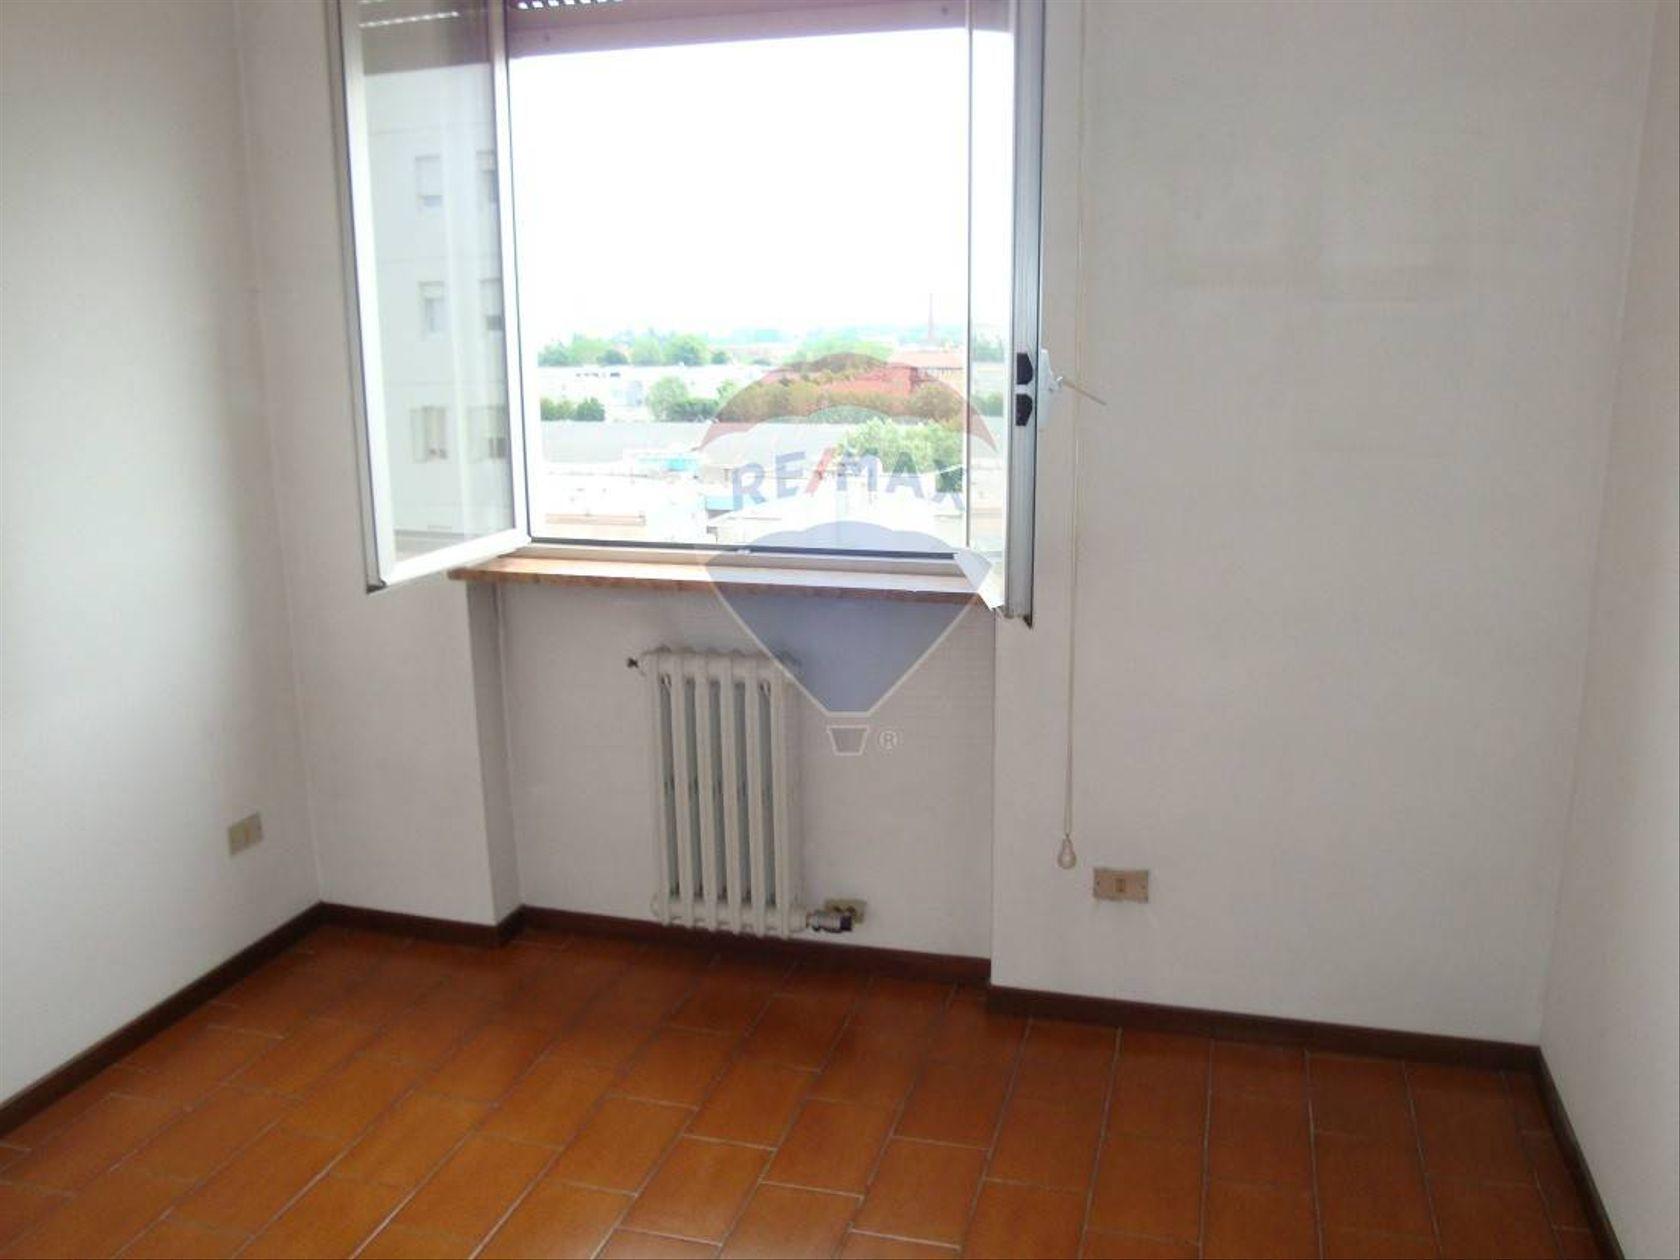 Appartamento Borgo Venezia, Verona, VR Vendita - Foto 24